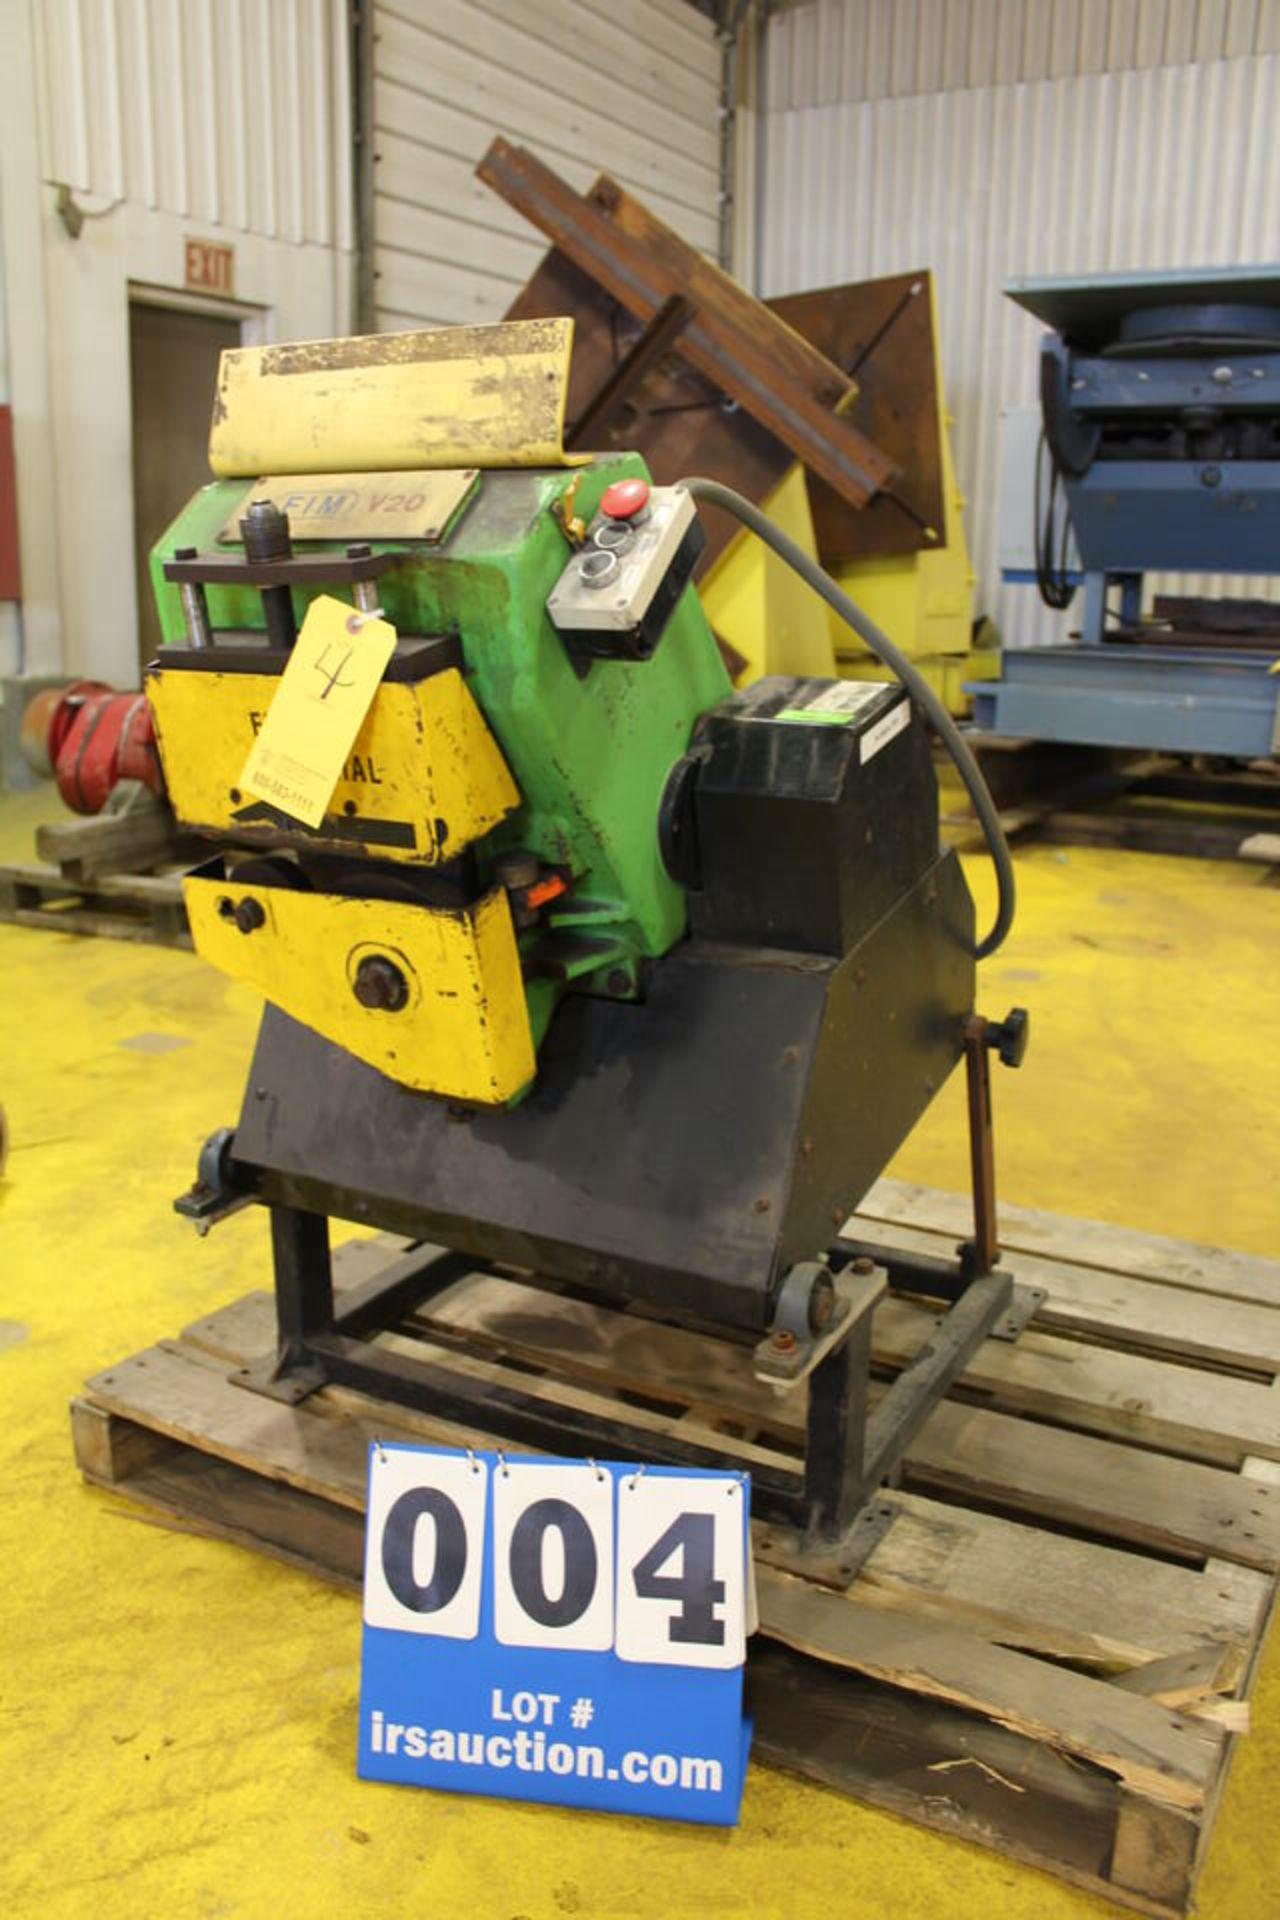 Lot 4 - FIM VERSA #20 BEVEL ER MACHINE, DOM:1996 (LOCATION: 4081 EASTSIDE HWY, STEVENSVILLE, MT, 59870)